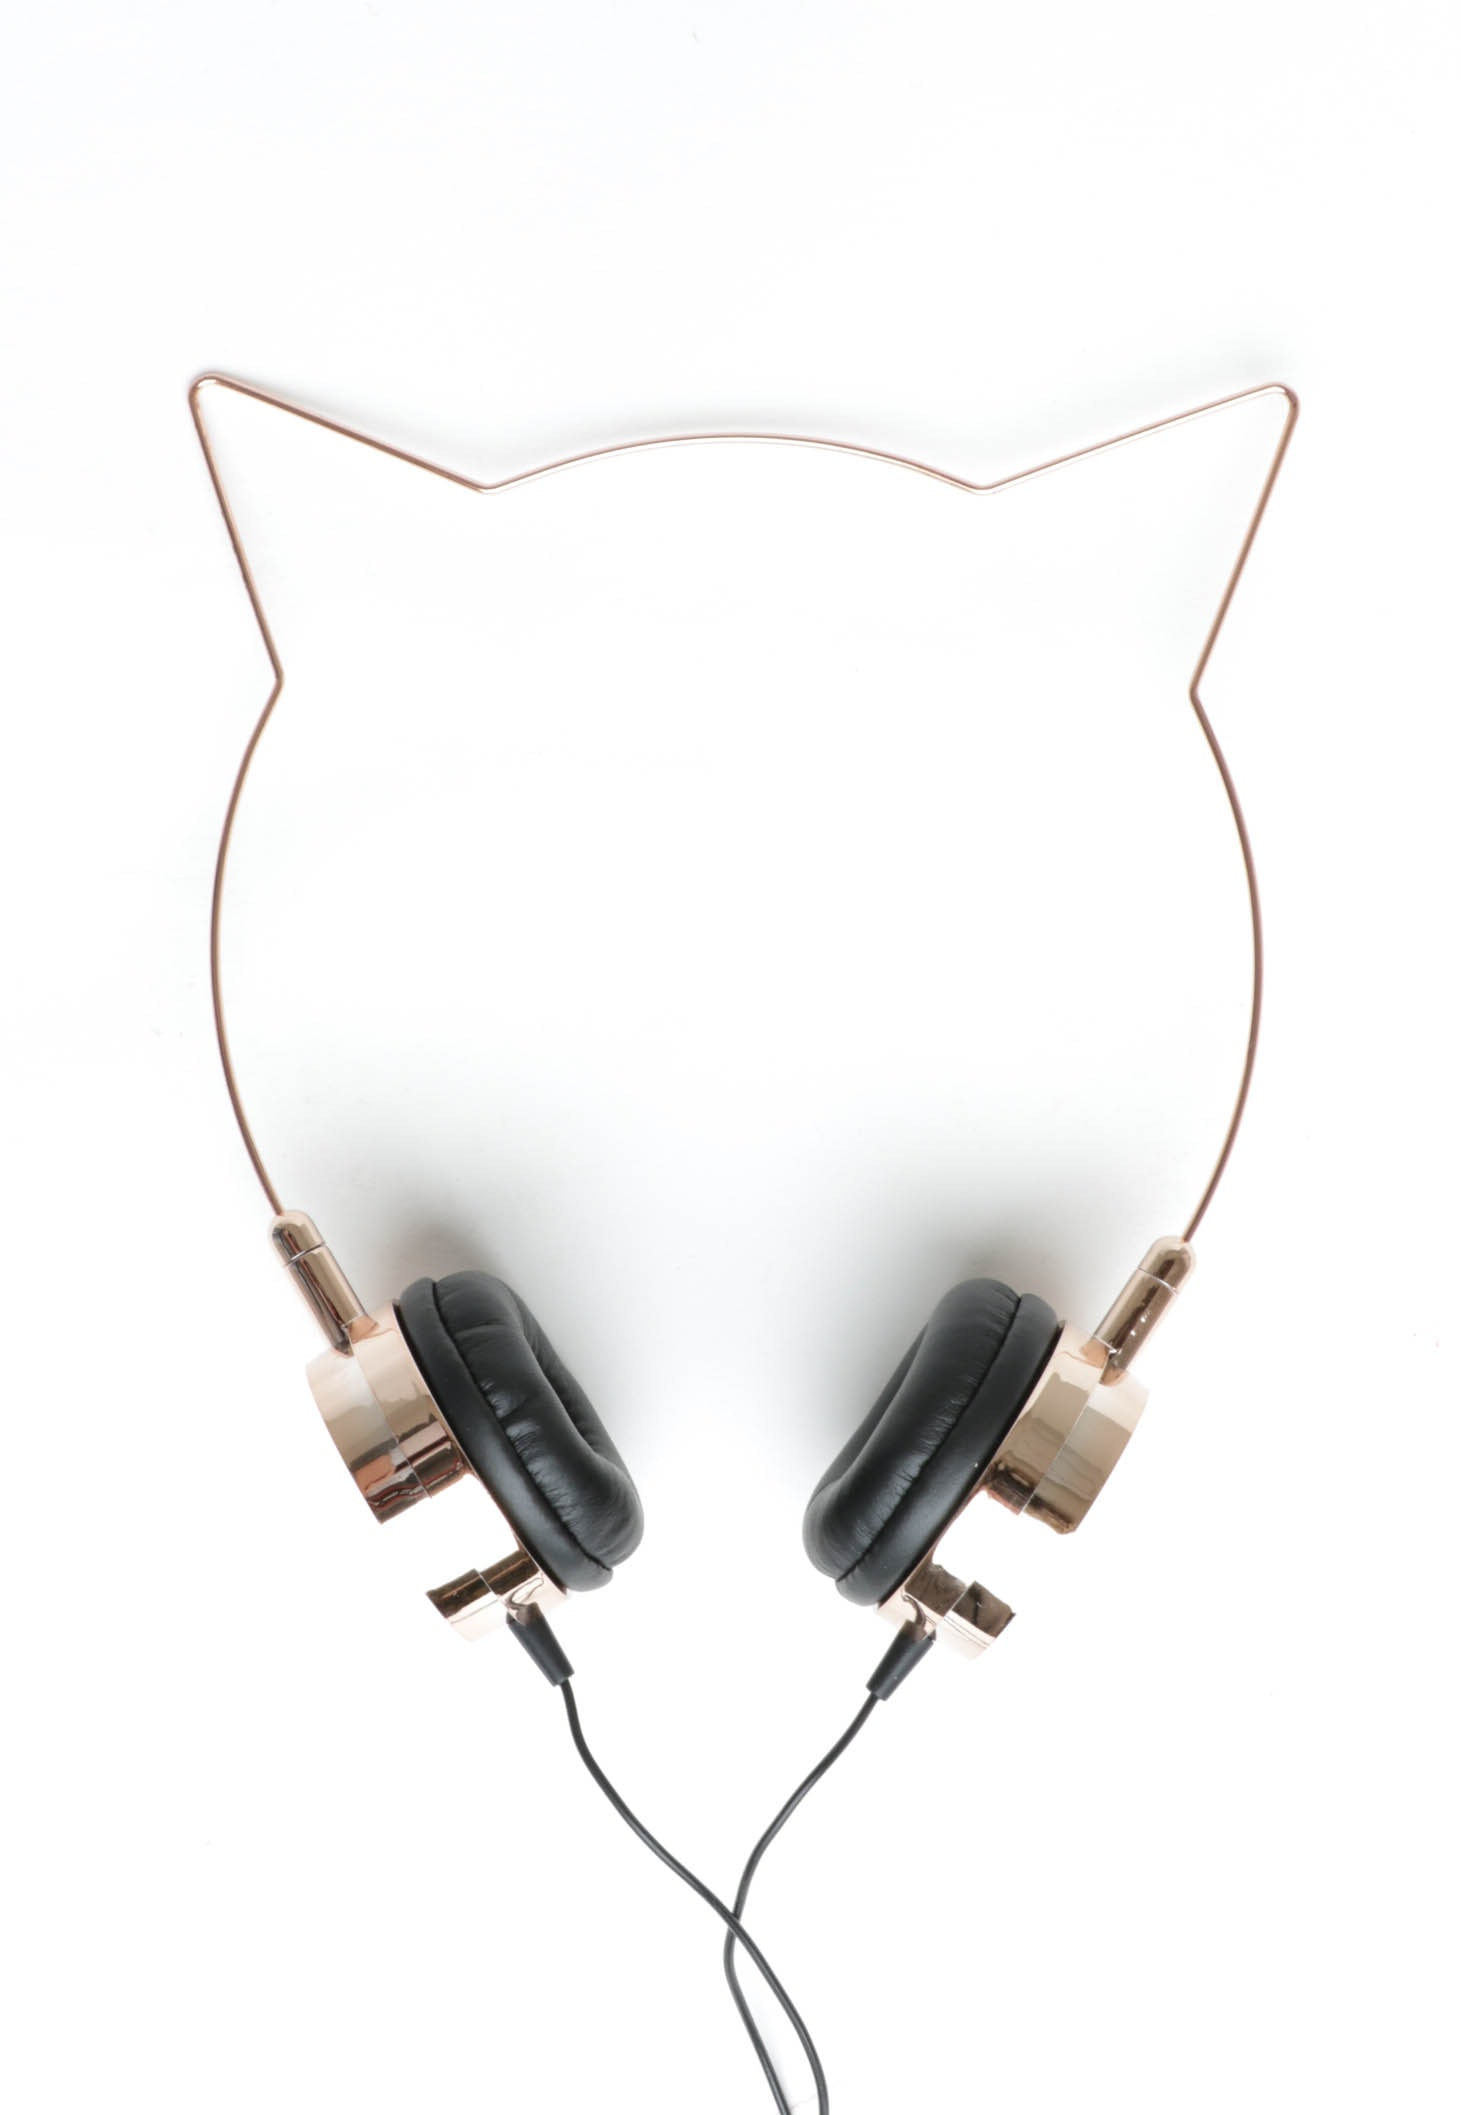 Wire Kitten Headphones - Rose Gold/Black